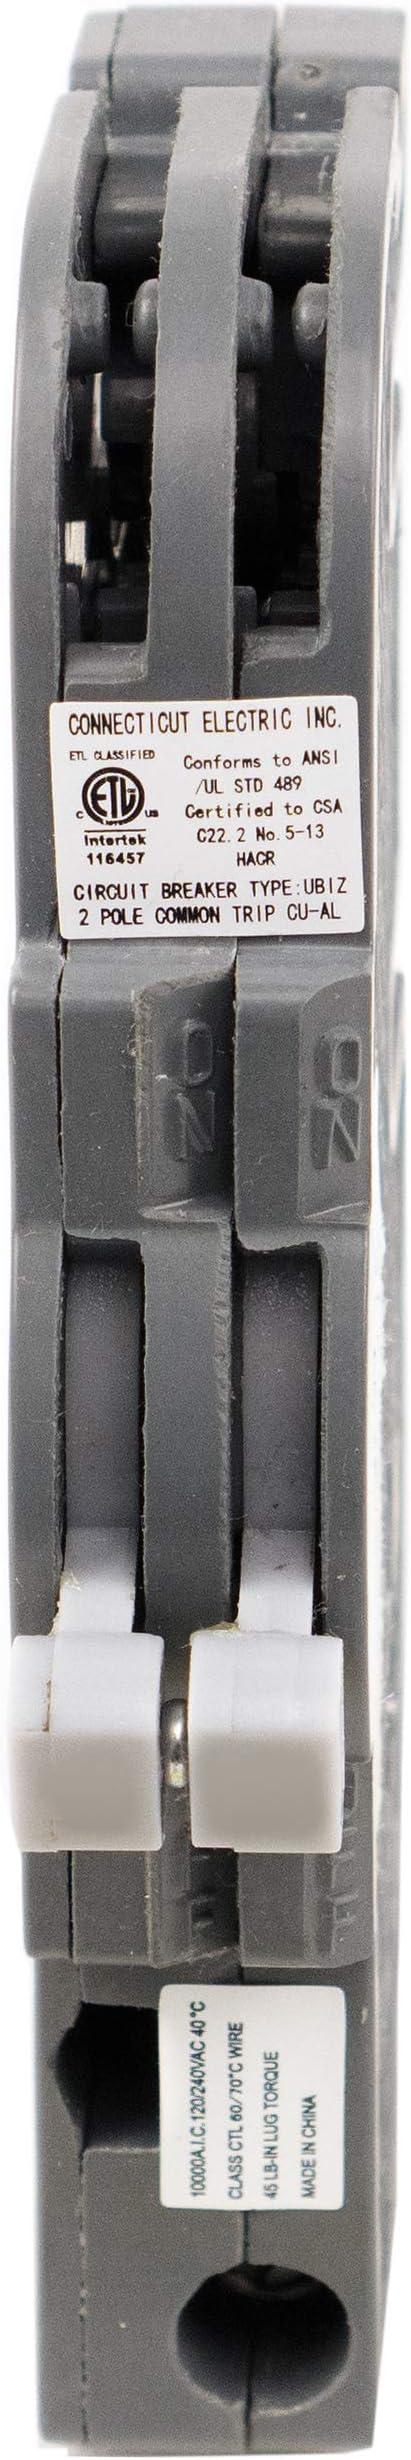 Warranty Sylvania C120 *LOT OF 5* 20 Amp 120 Volt Circuit Breaker